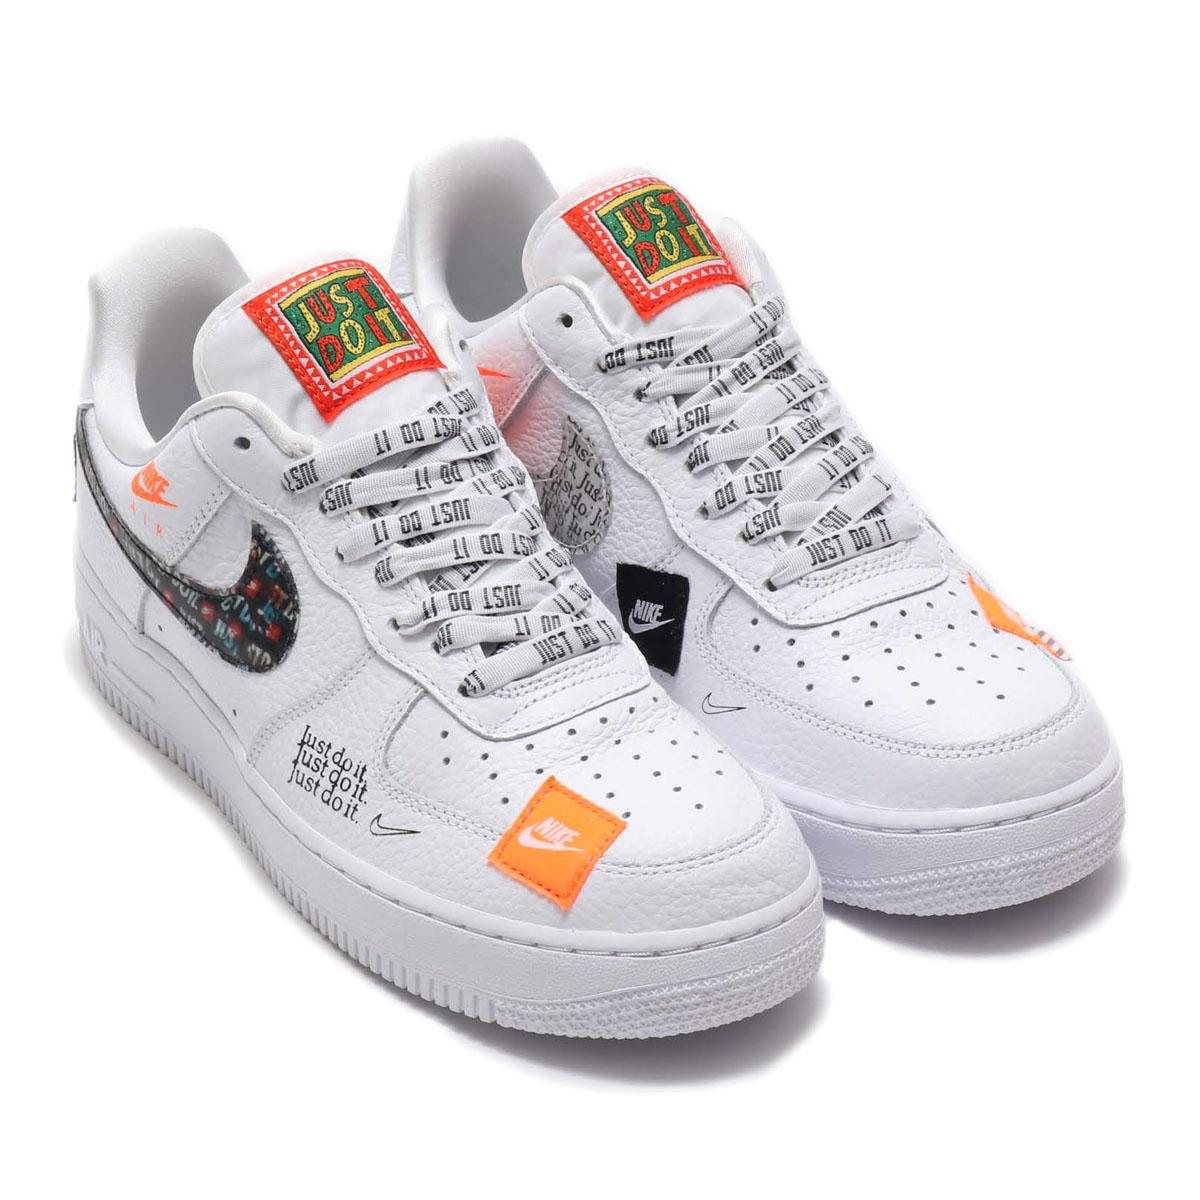 sports shoes 25196 3945a NIKE AIR FORCE 1  07 PRM JDI (Nike air force 1 07 premium JDI ...